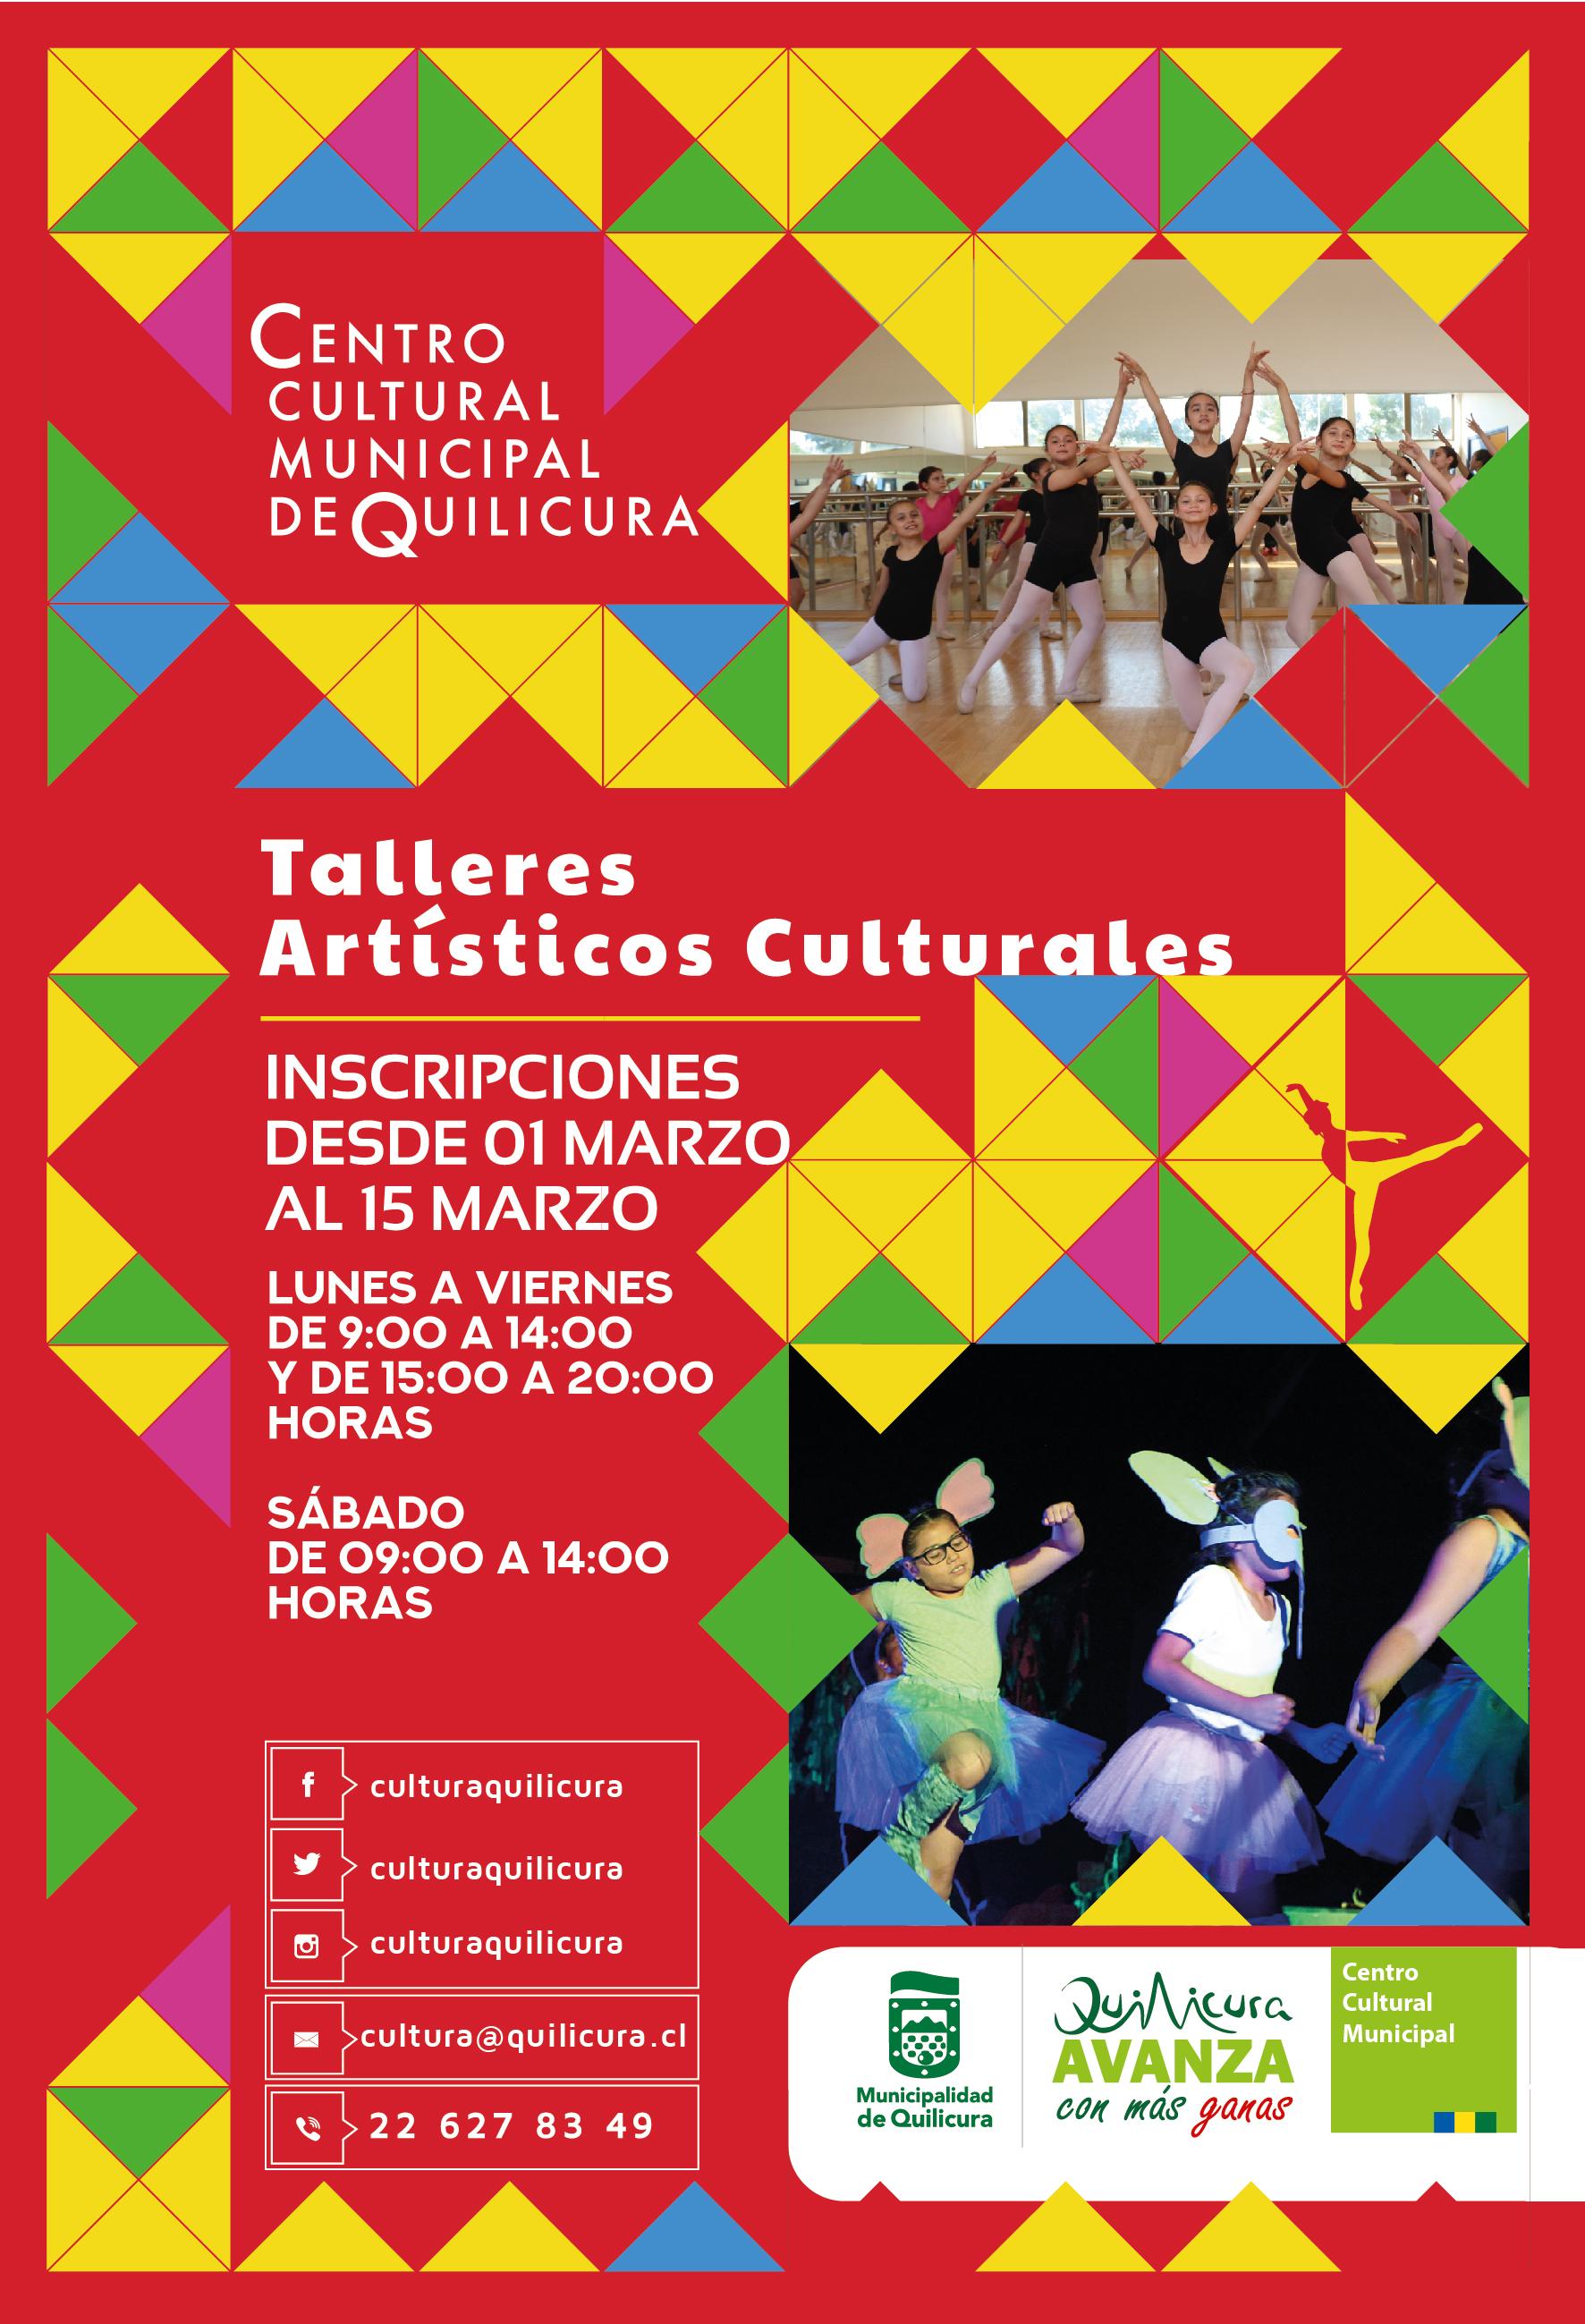 Talleres Artísticos Culturales @ Centro Cultural Municipal